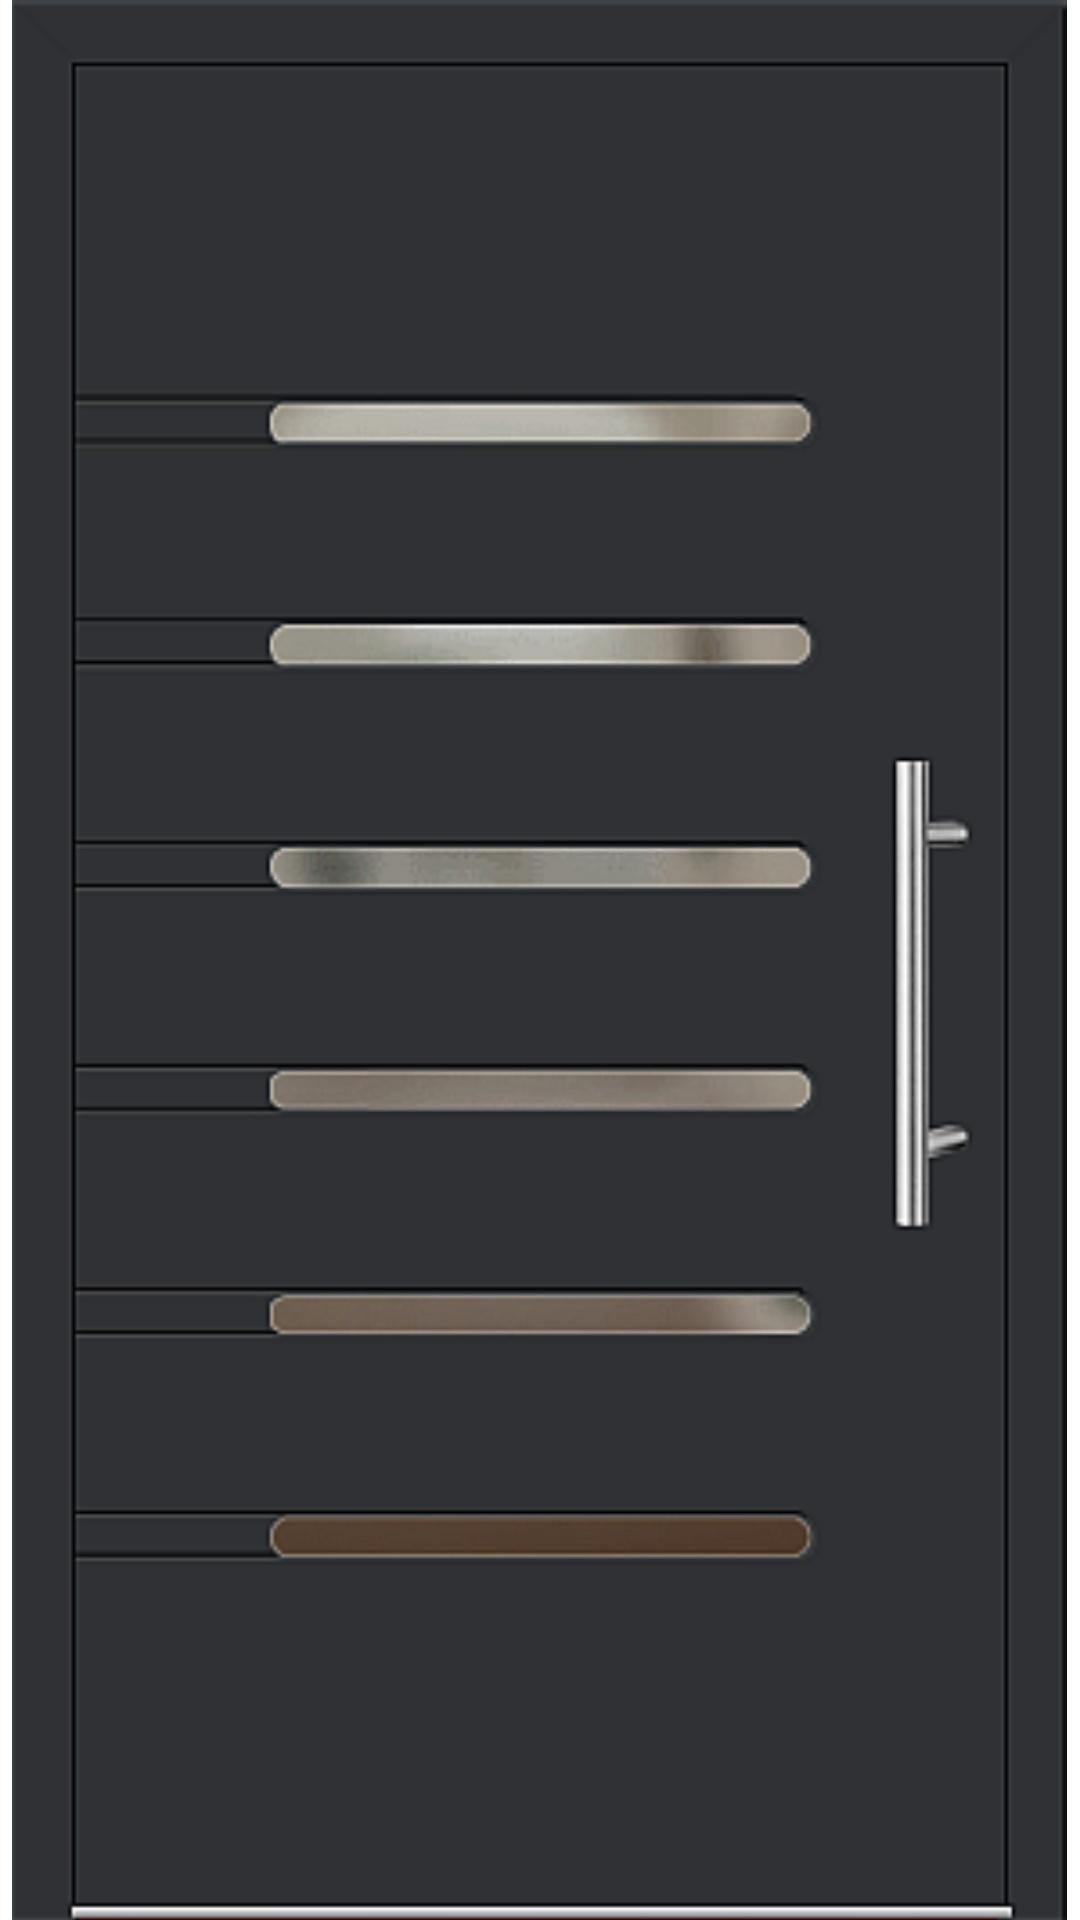 Aluminium Haustür Modell 6936-40 schwarz